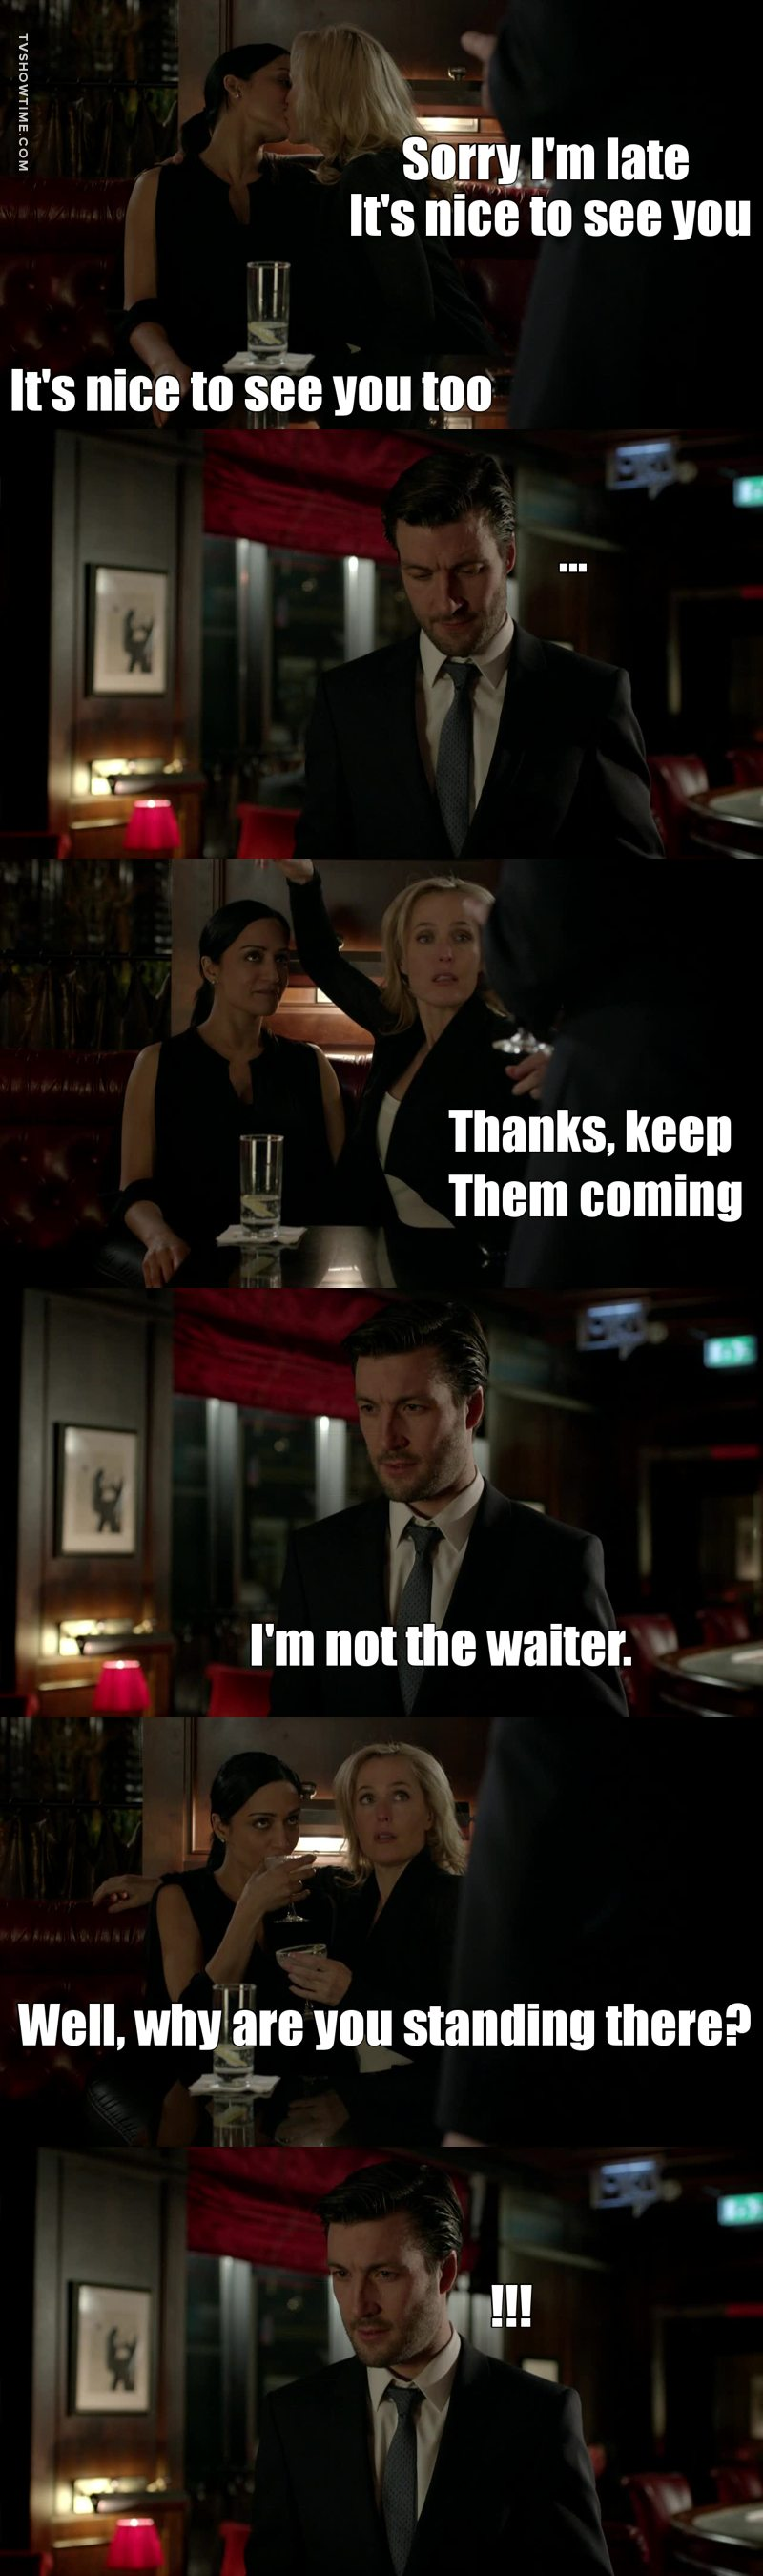 Hahaha Stella 😂👌🏼